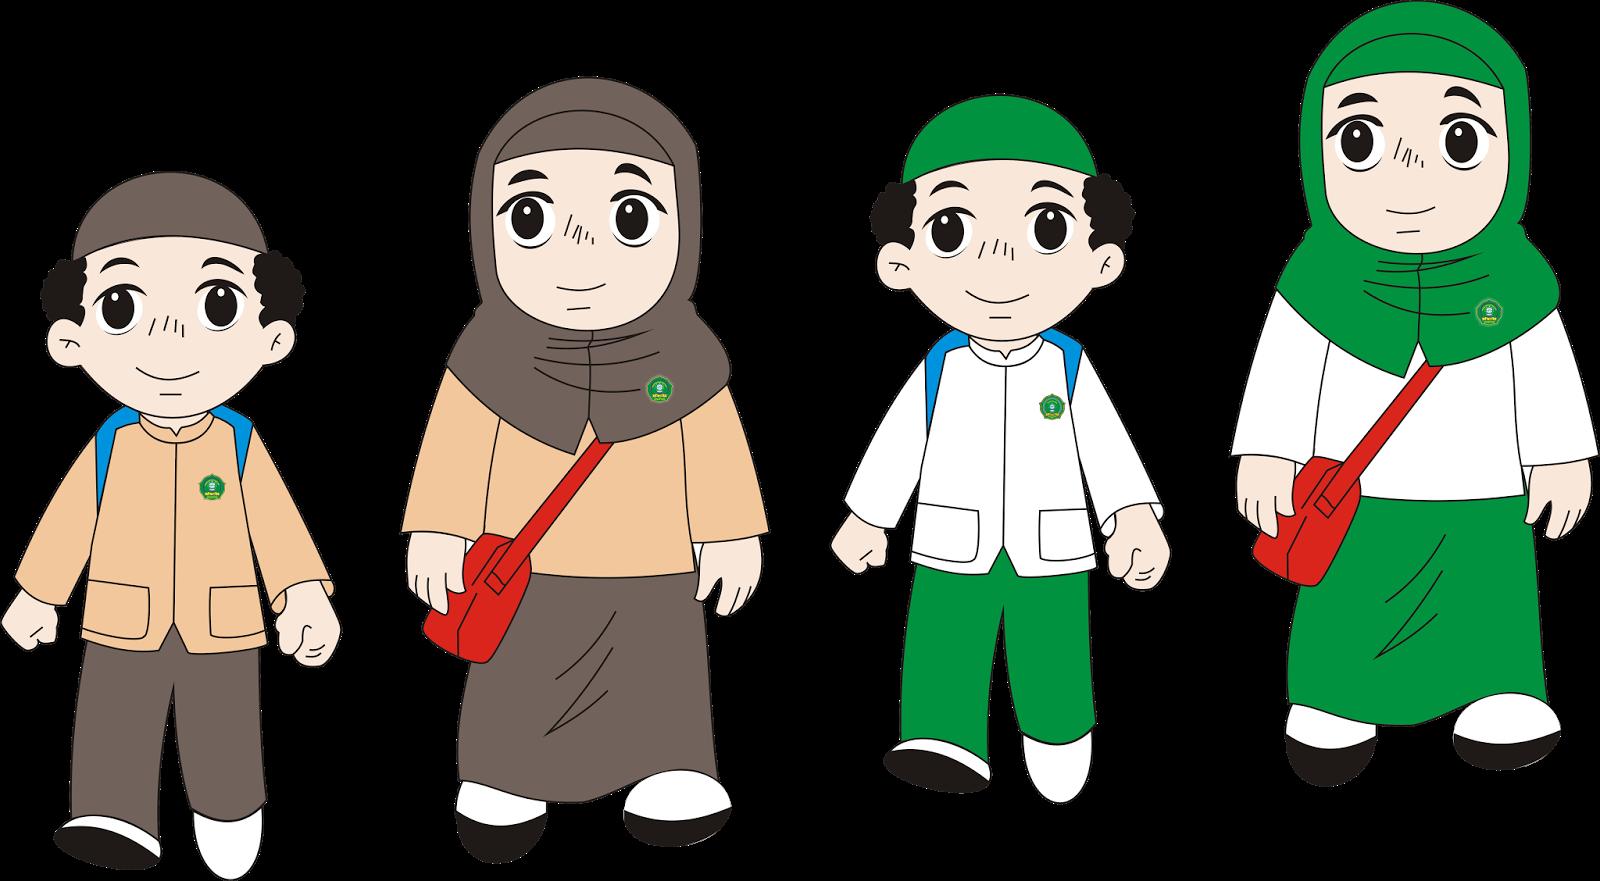 Gambar Kartun Anak Sekolah Png Nusagates